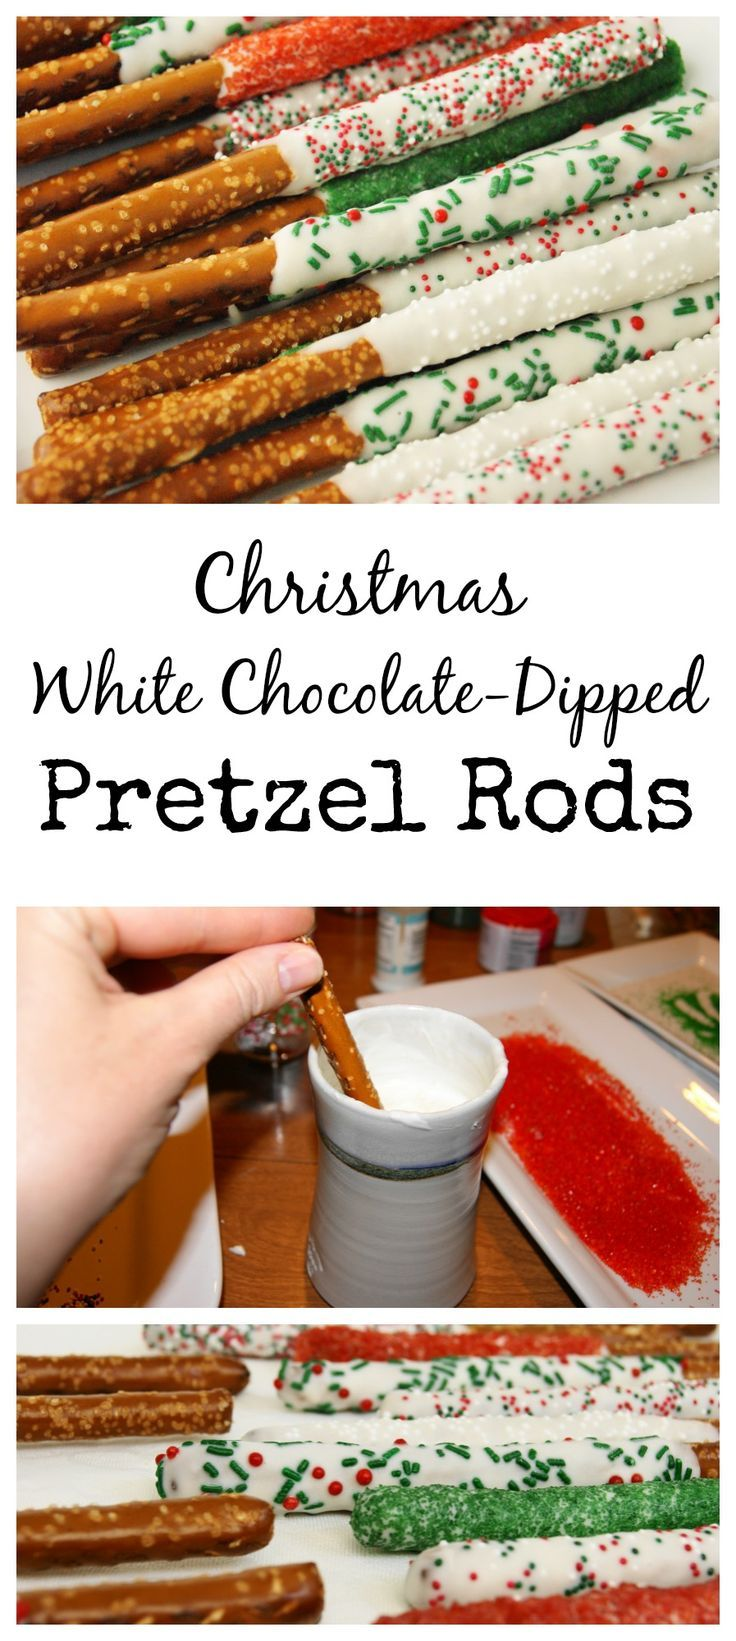 Easy Christmas White Chocolate-Dipped Pretzel Rods www.thekitchenismyplayground.com